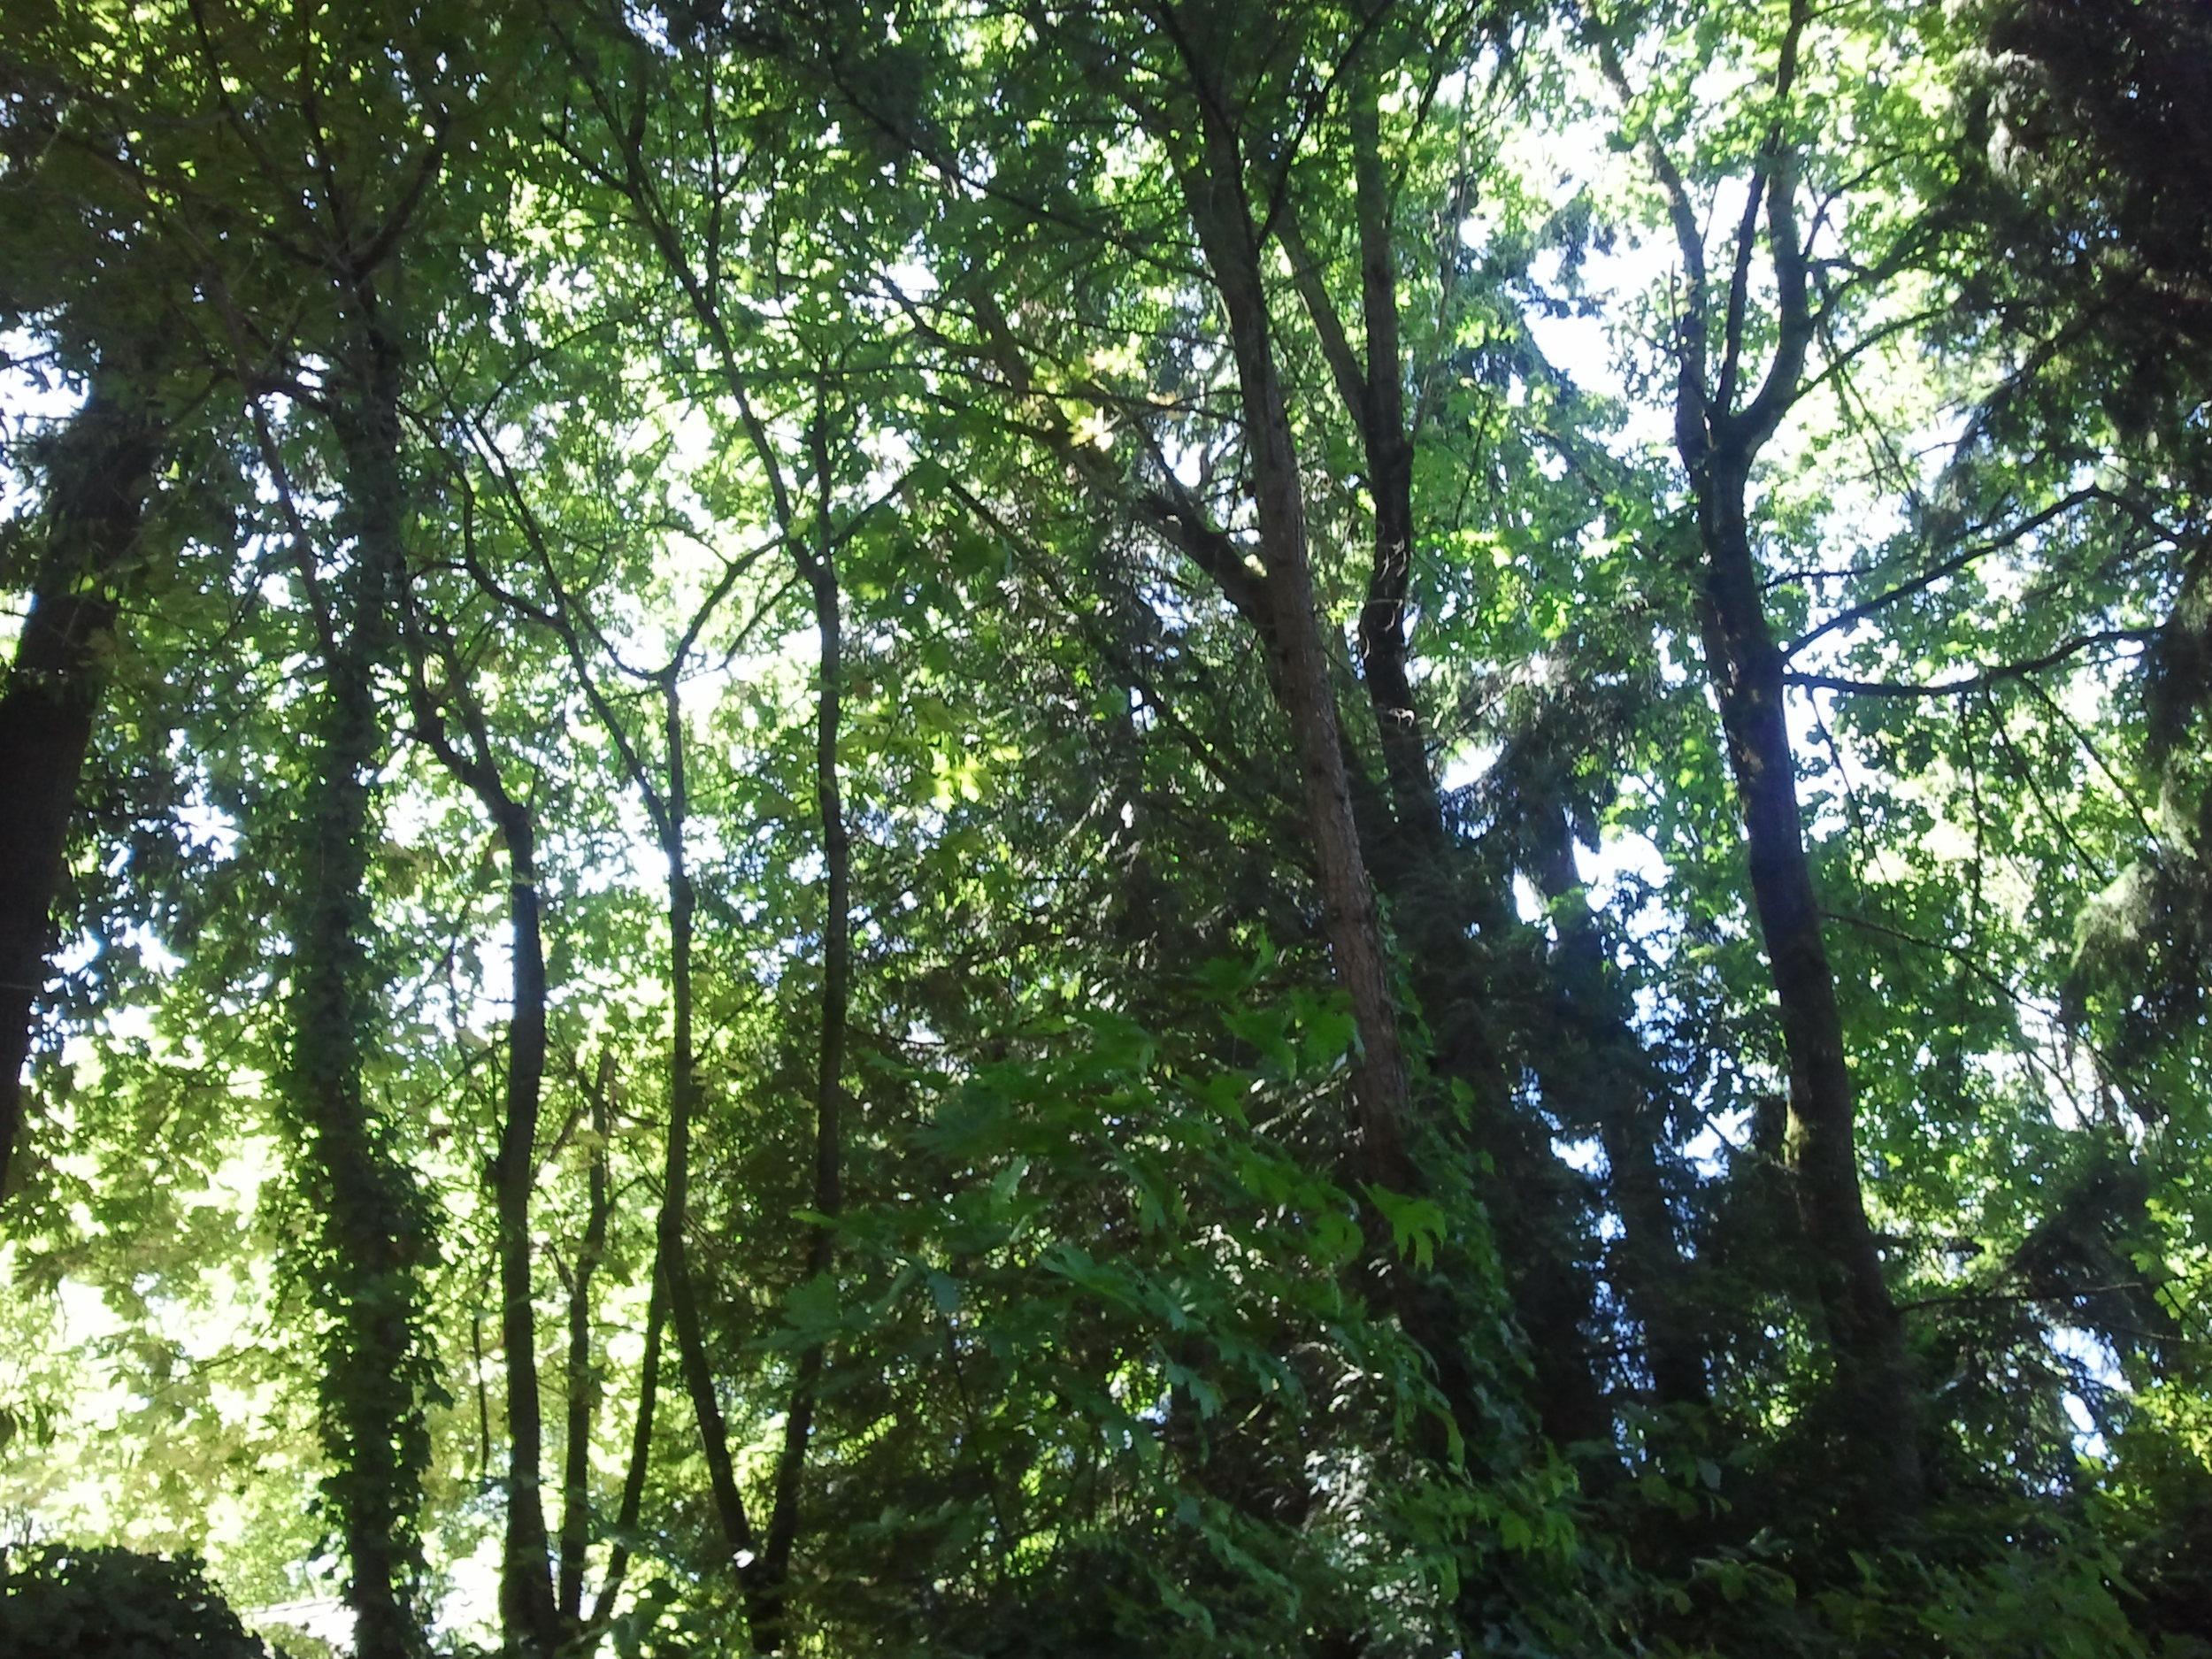 Ivy invaded forest in Bellevue, Washington